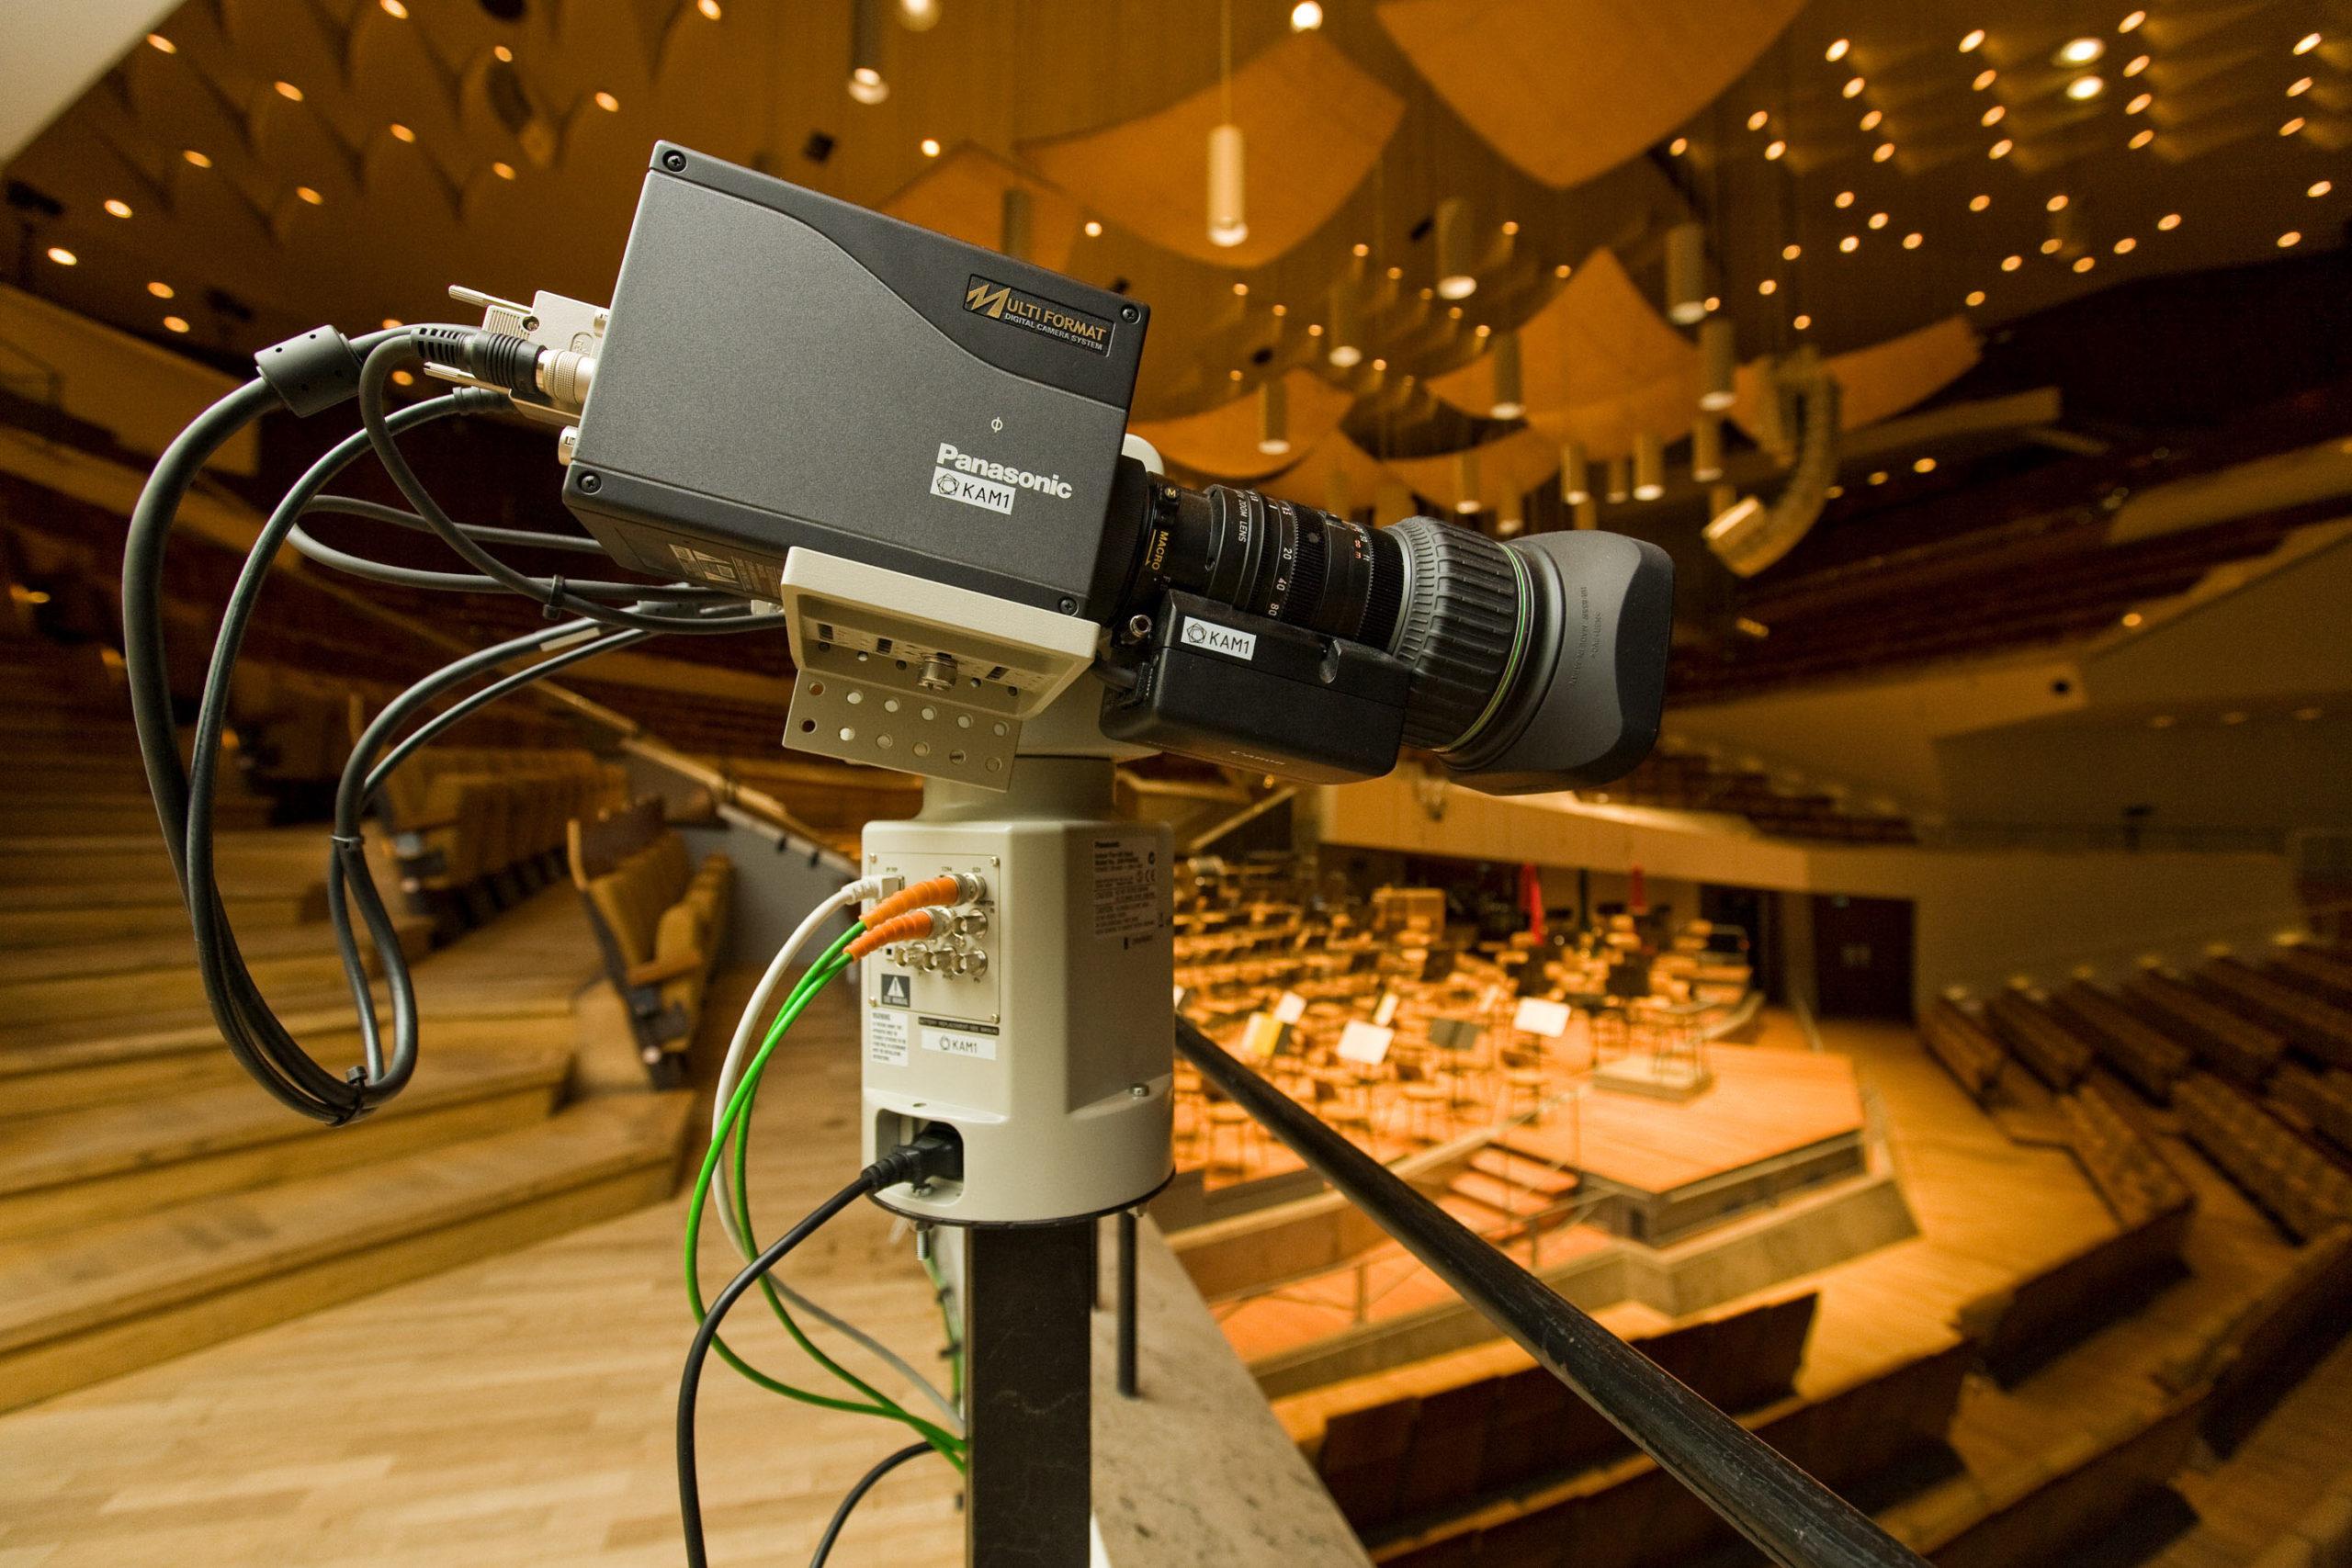 dch-kamera-1-peteradamik